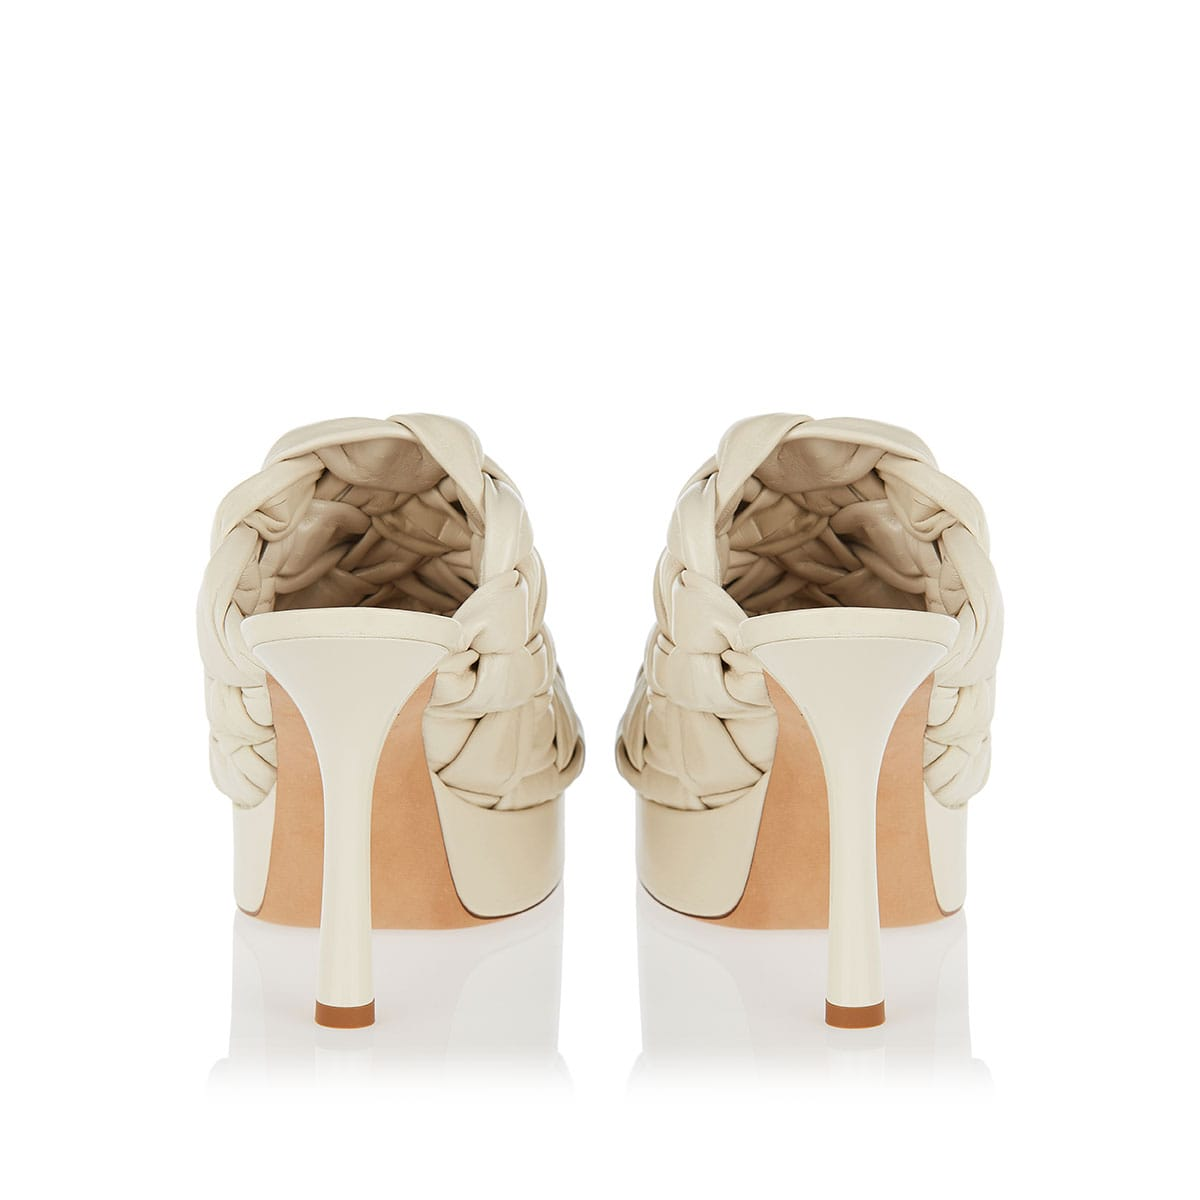 BV Board woven sandals